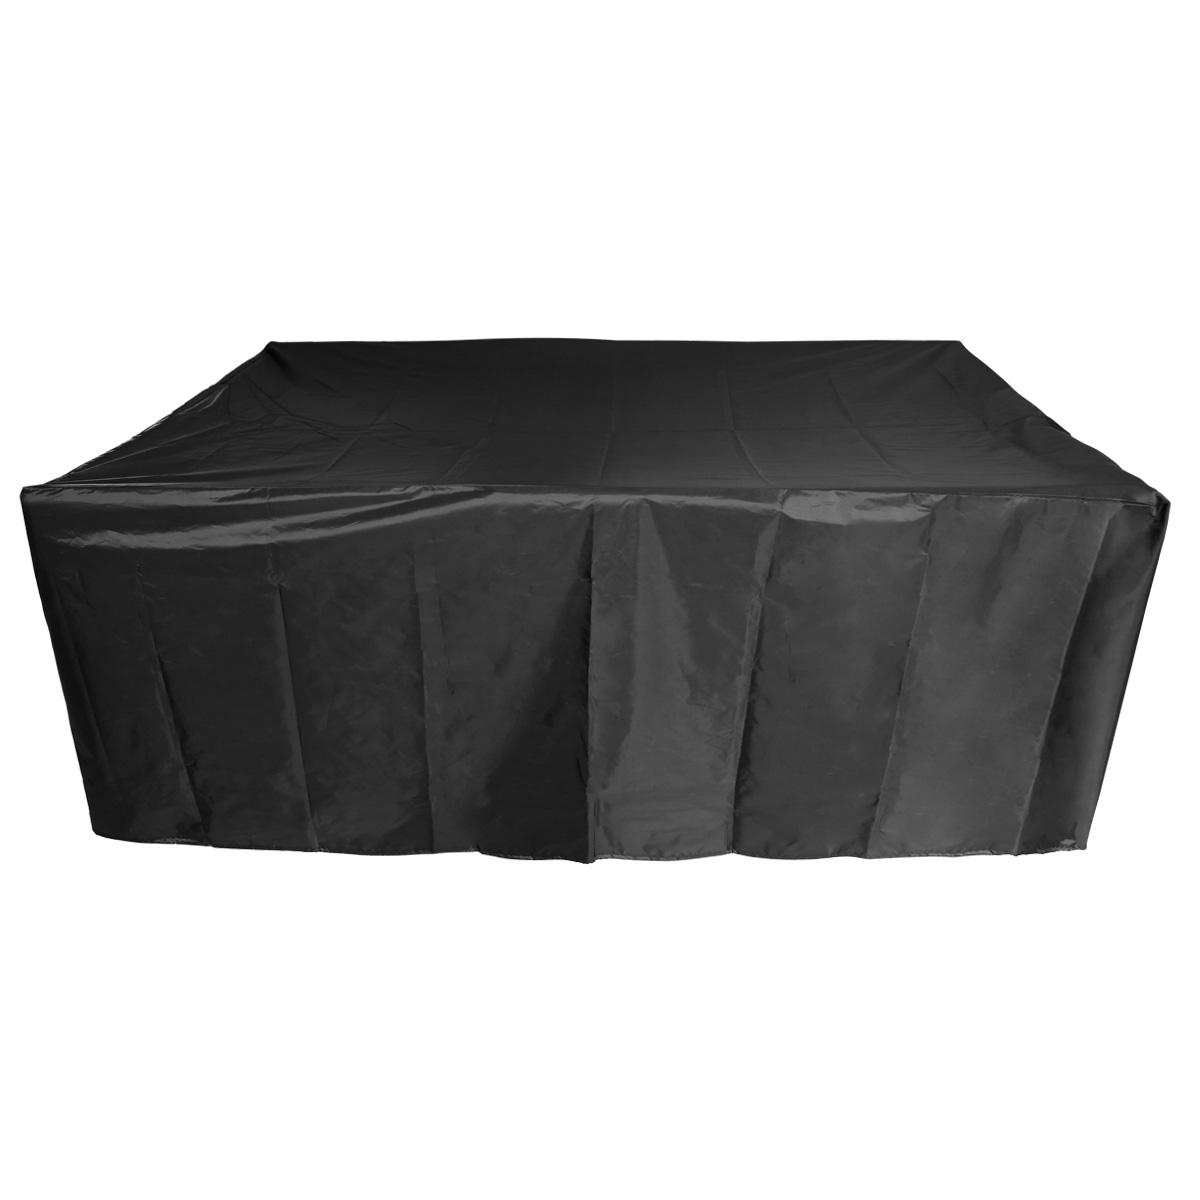 Funda para Muebles de Jardín Exterior Impermeable Cubierta ...